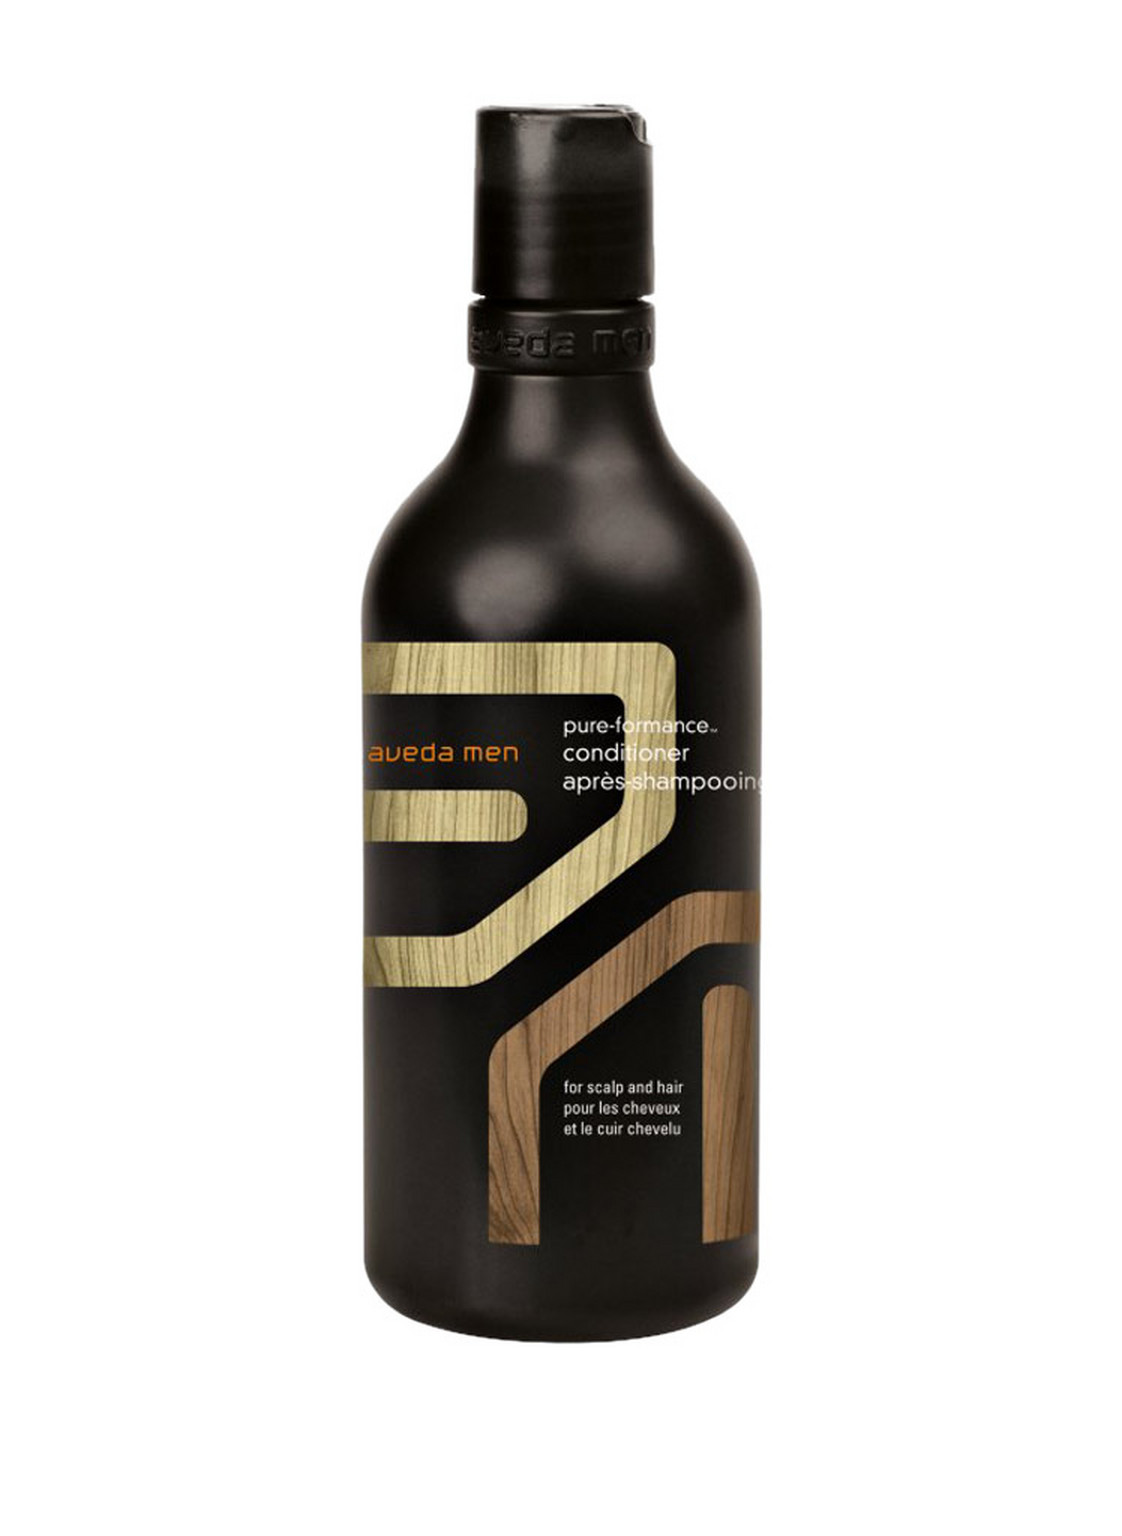 Image of Aveda Aveda Men Pure-Formance Conditioner 300 ml